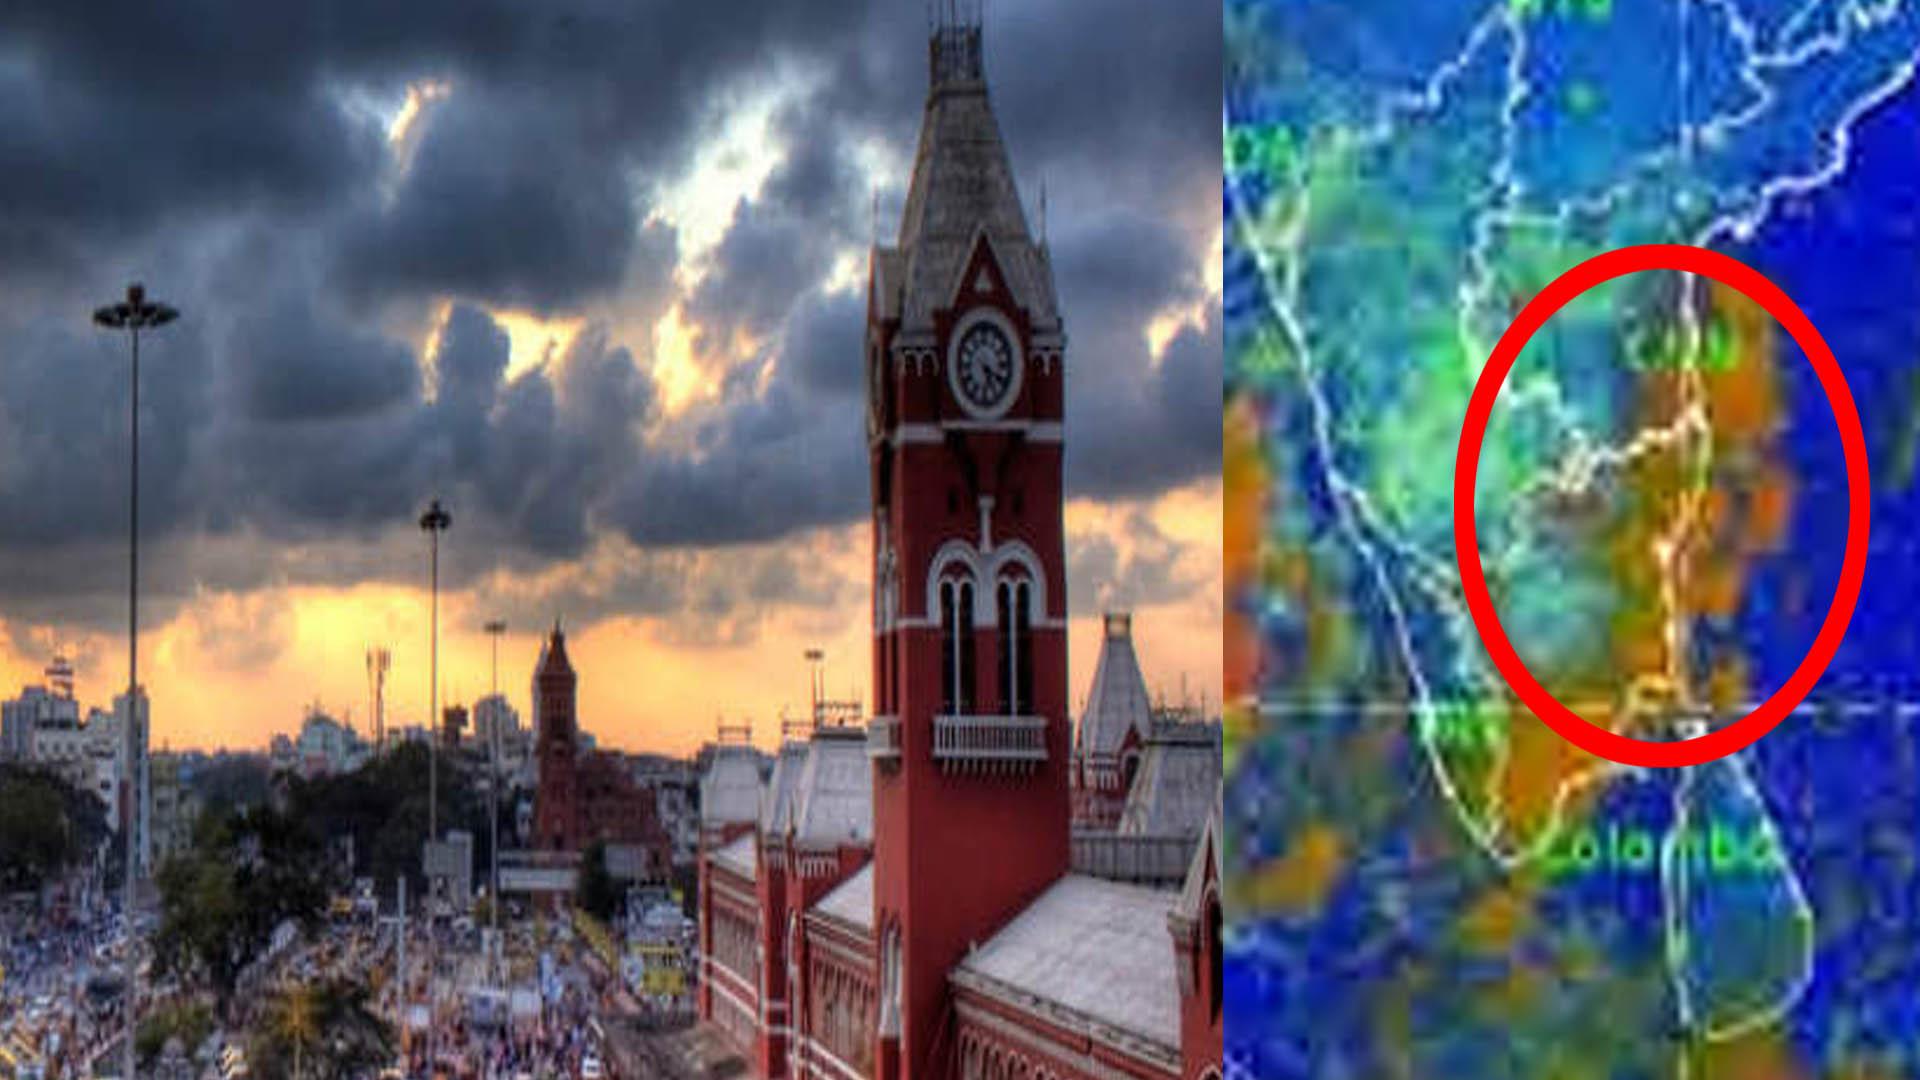 weatherman| தென்மேற்கு பருவமழையின் அற்புதமான நாள்.. தமிழ்நாடு வேதர்மேன்